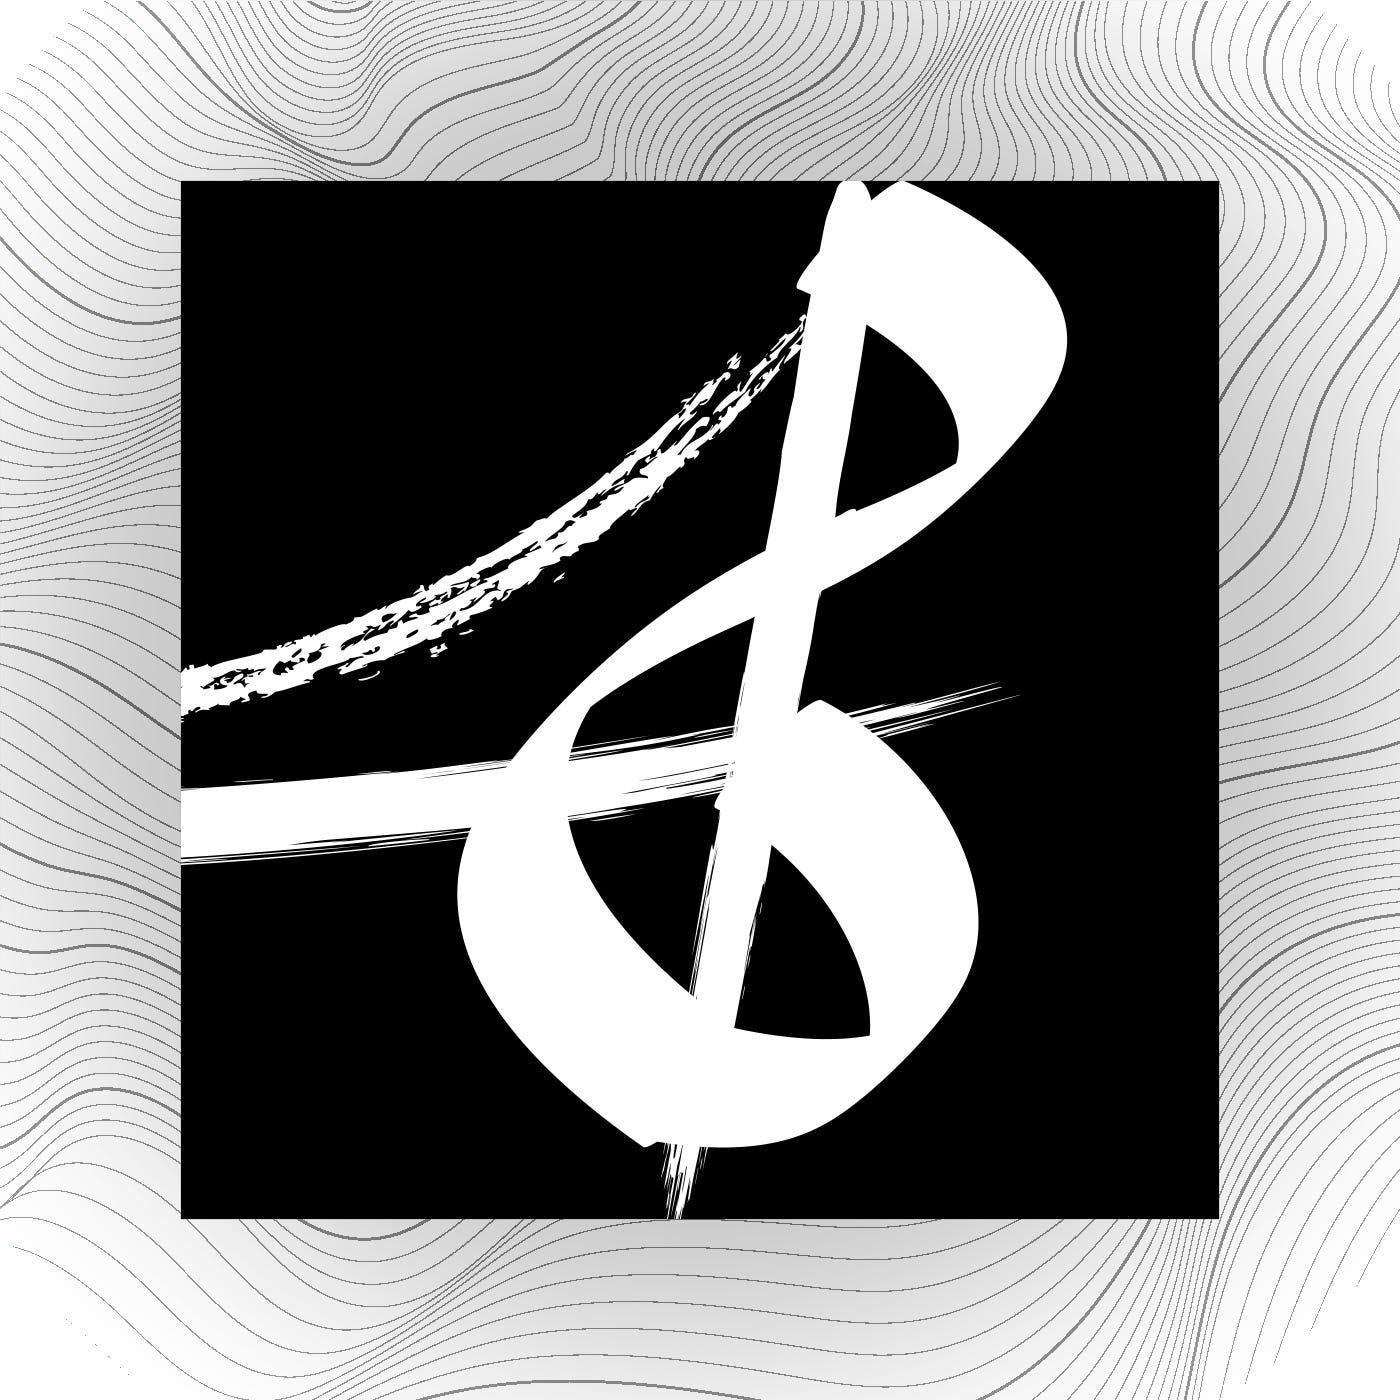 WGJC - Greenville Jazz Collective